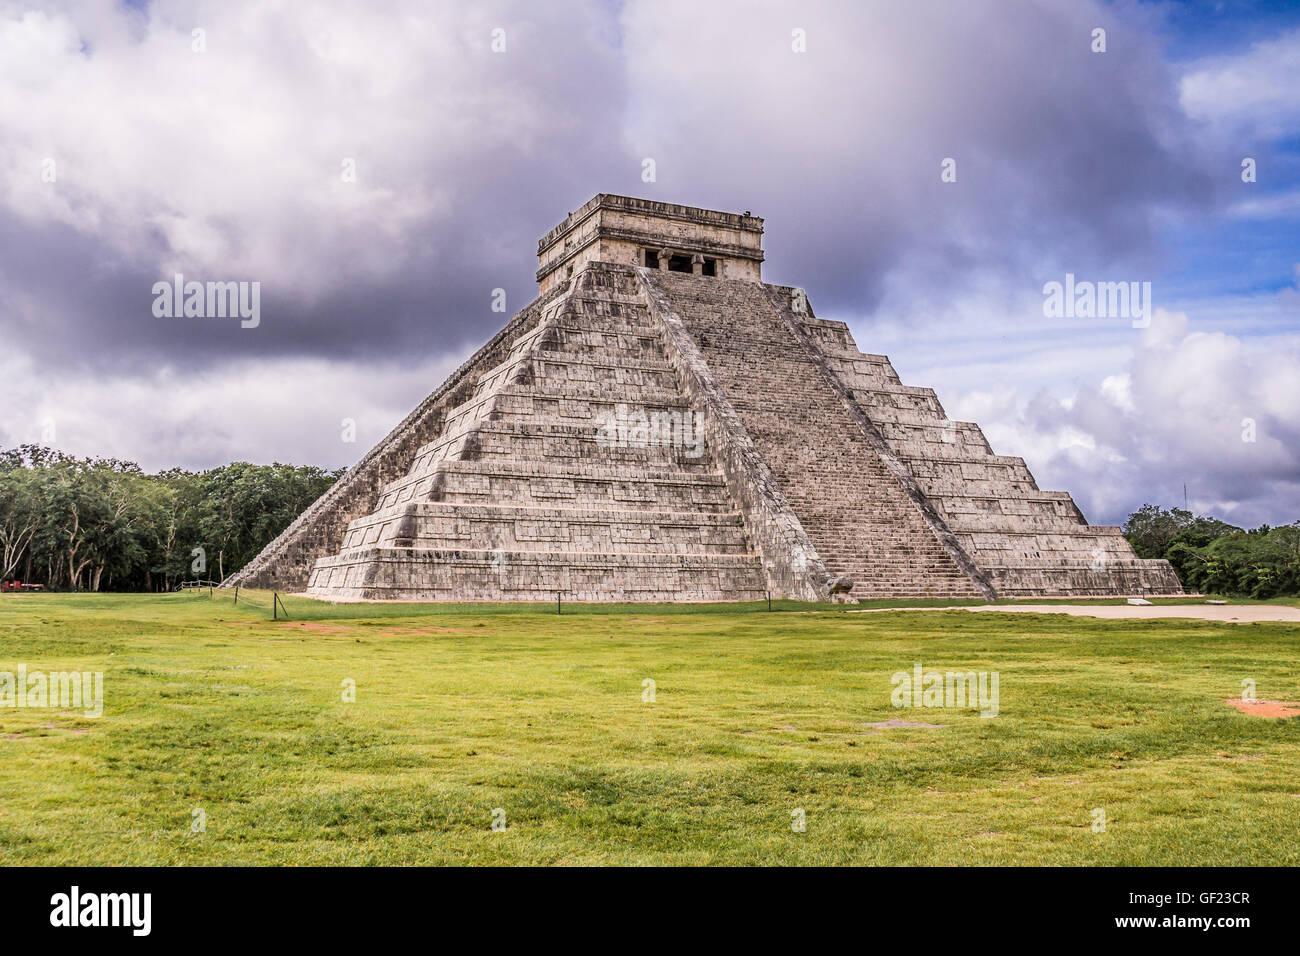 Pyramide Maya Chichen Itza, Yucatan, Mexique Photo Stock